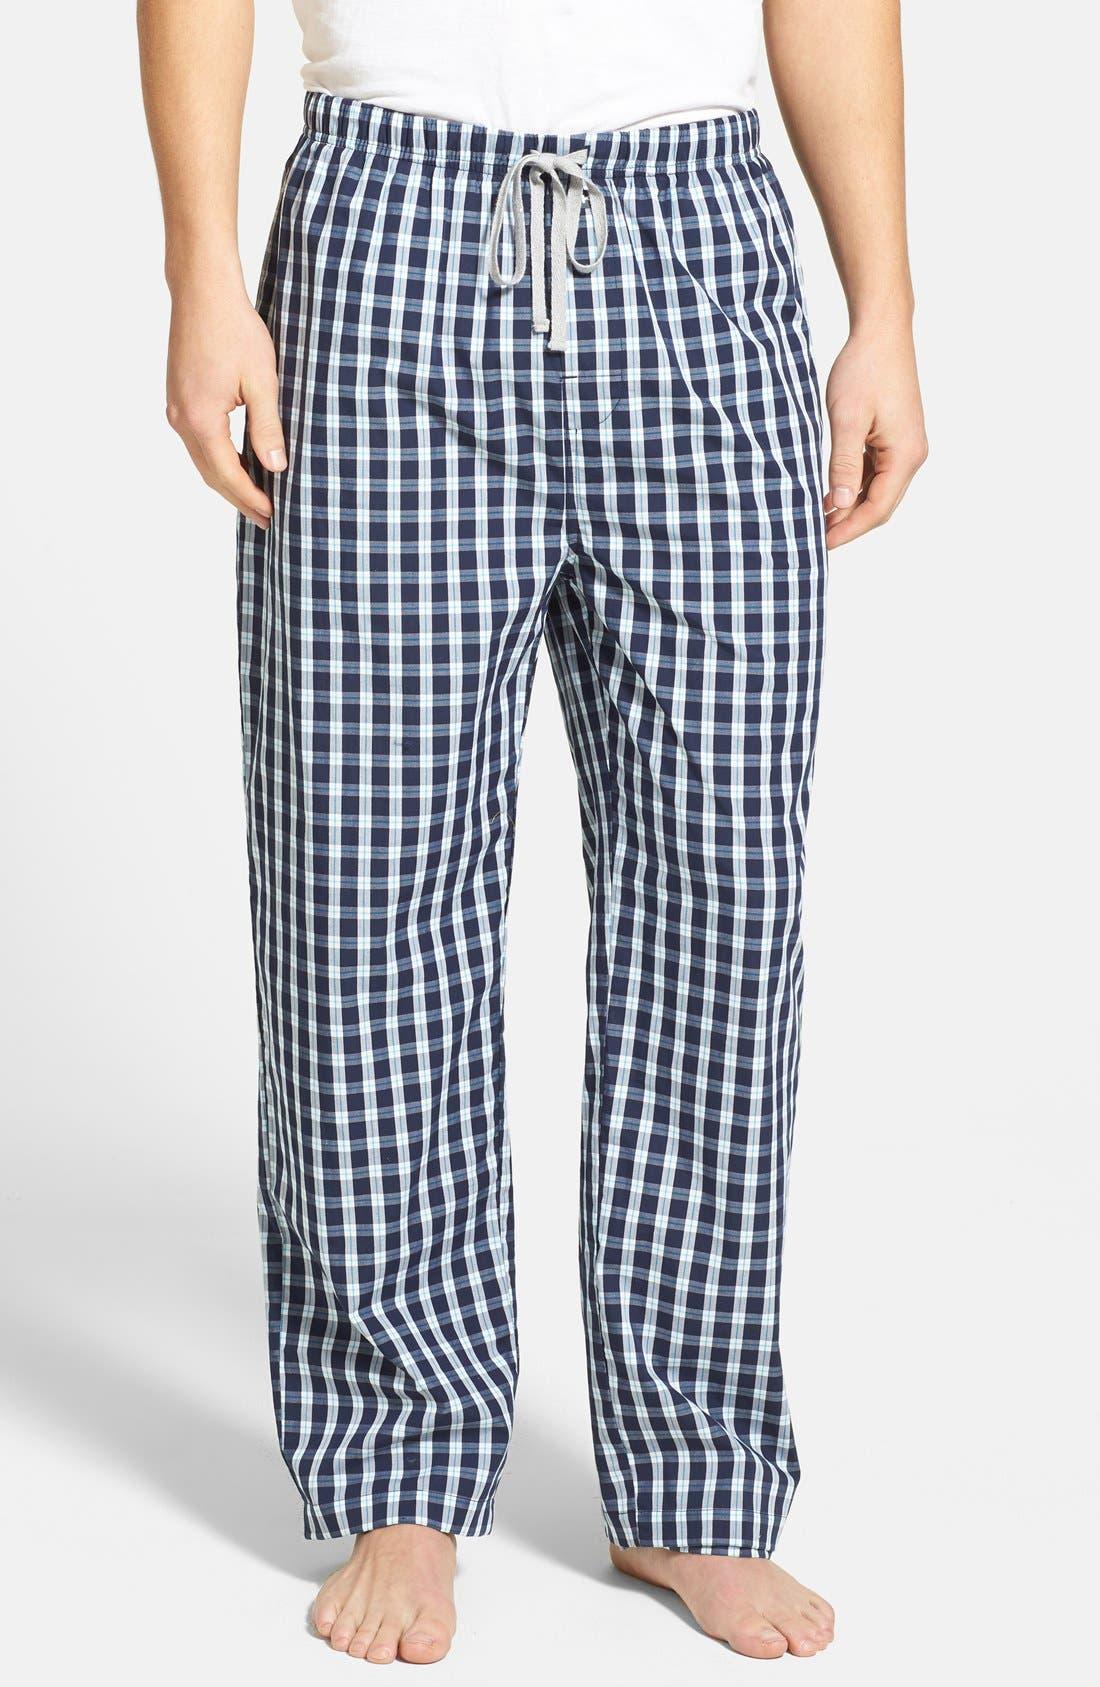 Alternate Image 1 Selected - Michael Kors Check Lounge Pants